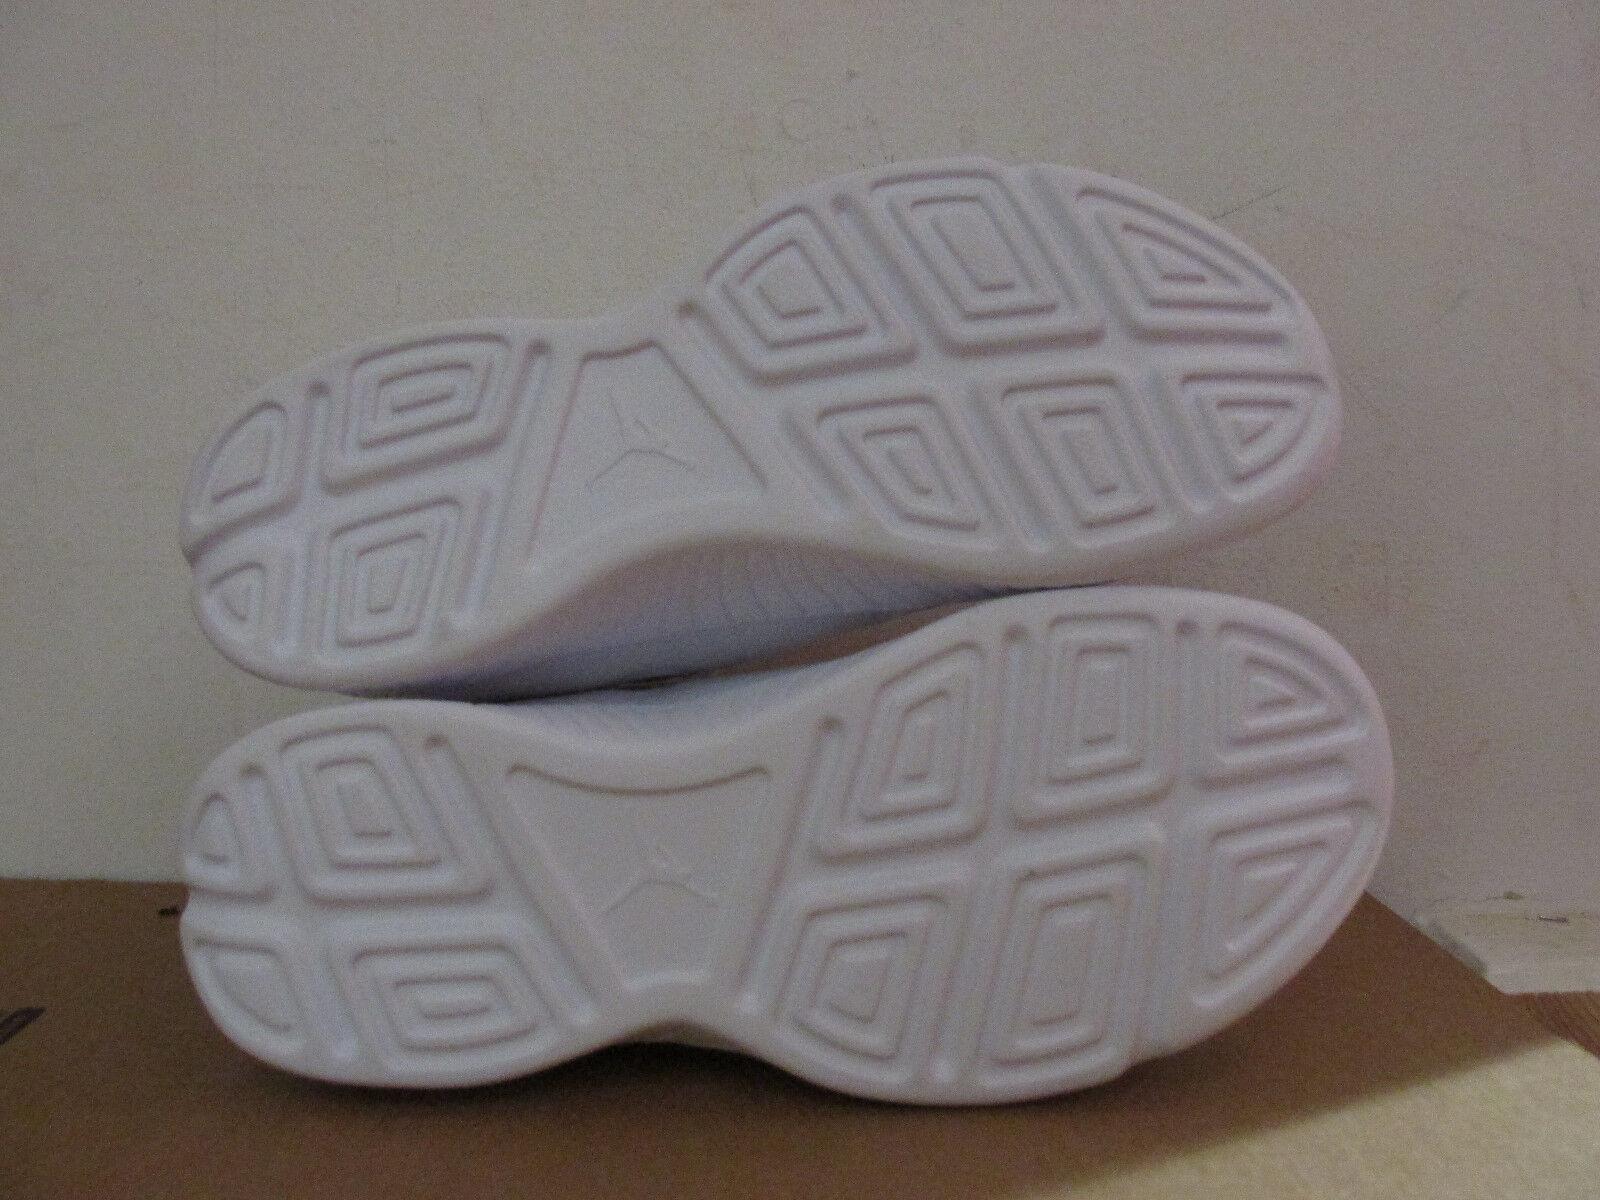 Nike Air Jordan J23 100 Bas Tennis Basketball Hommes 905288 100 J23 Enlèvement ab52be